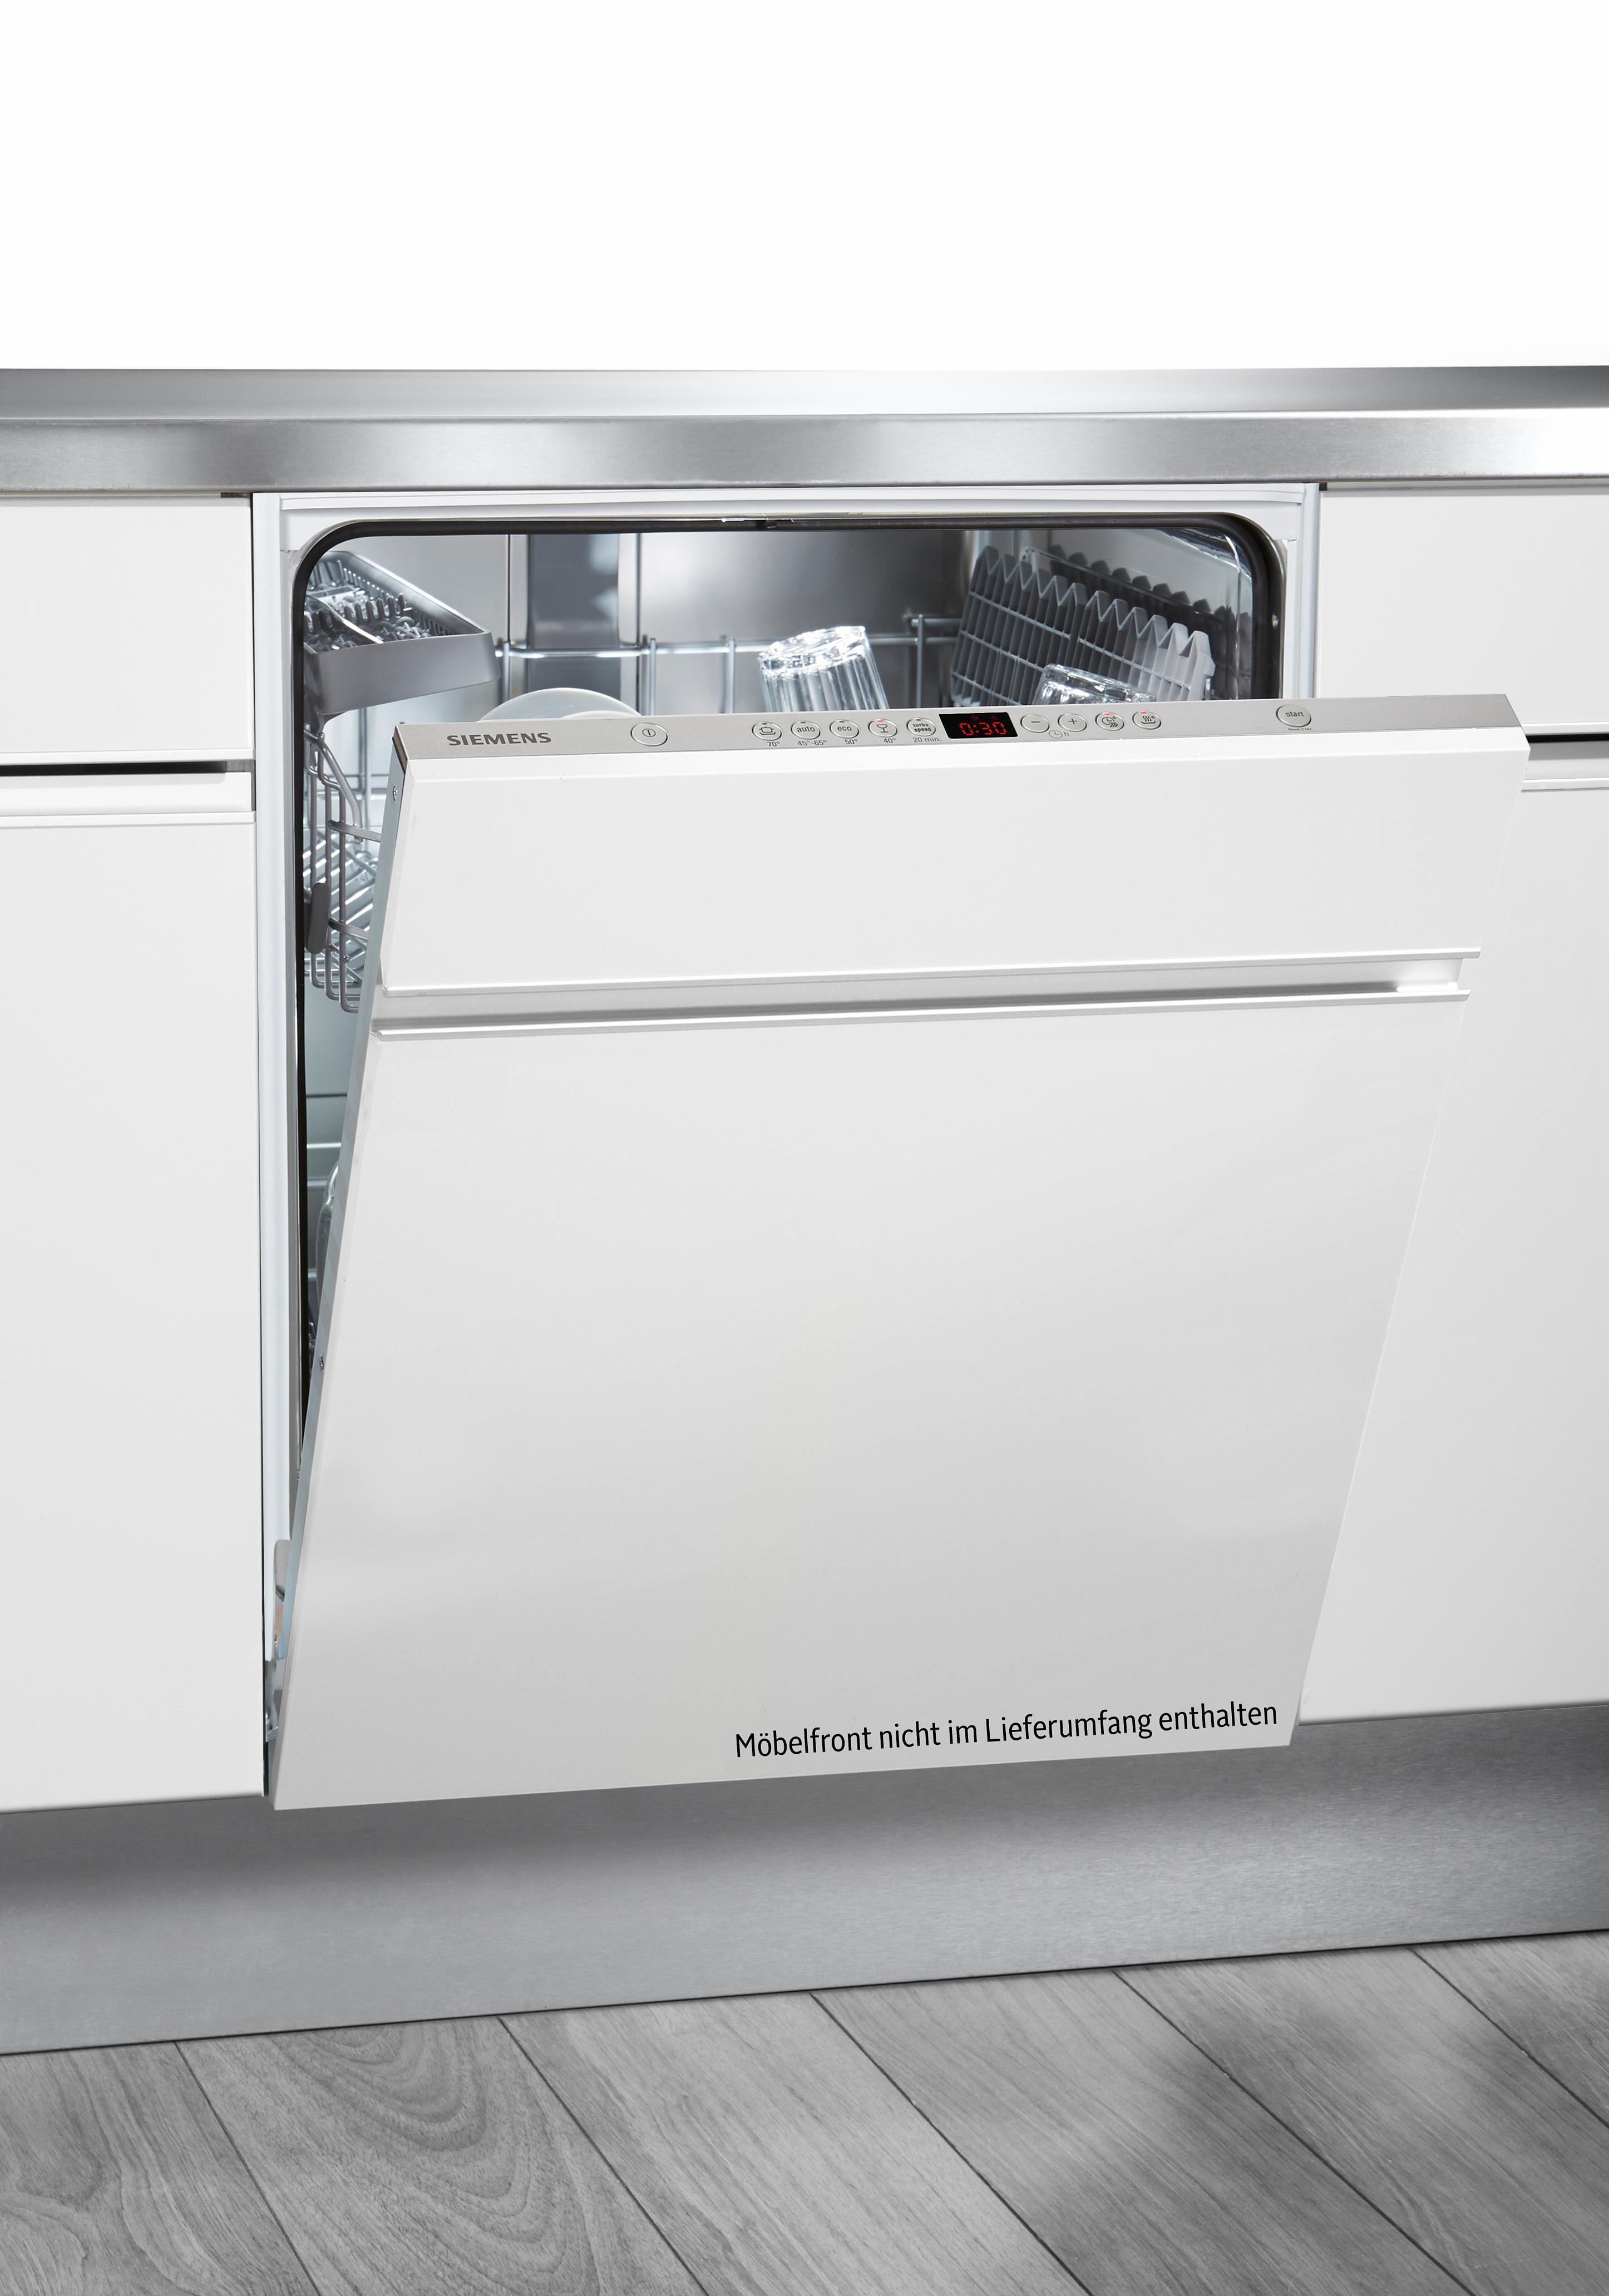 SIEMENS Vollintegrierbarer Einbaugeschirrspüler iQ500 SN65P032EU, A++, 6,5 Liter, 13 Maßgedecke